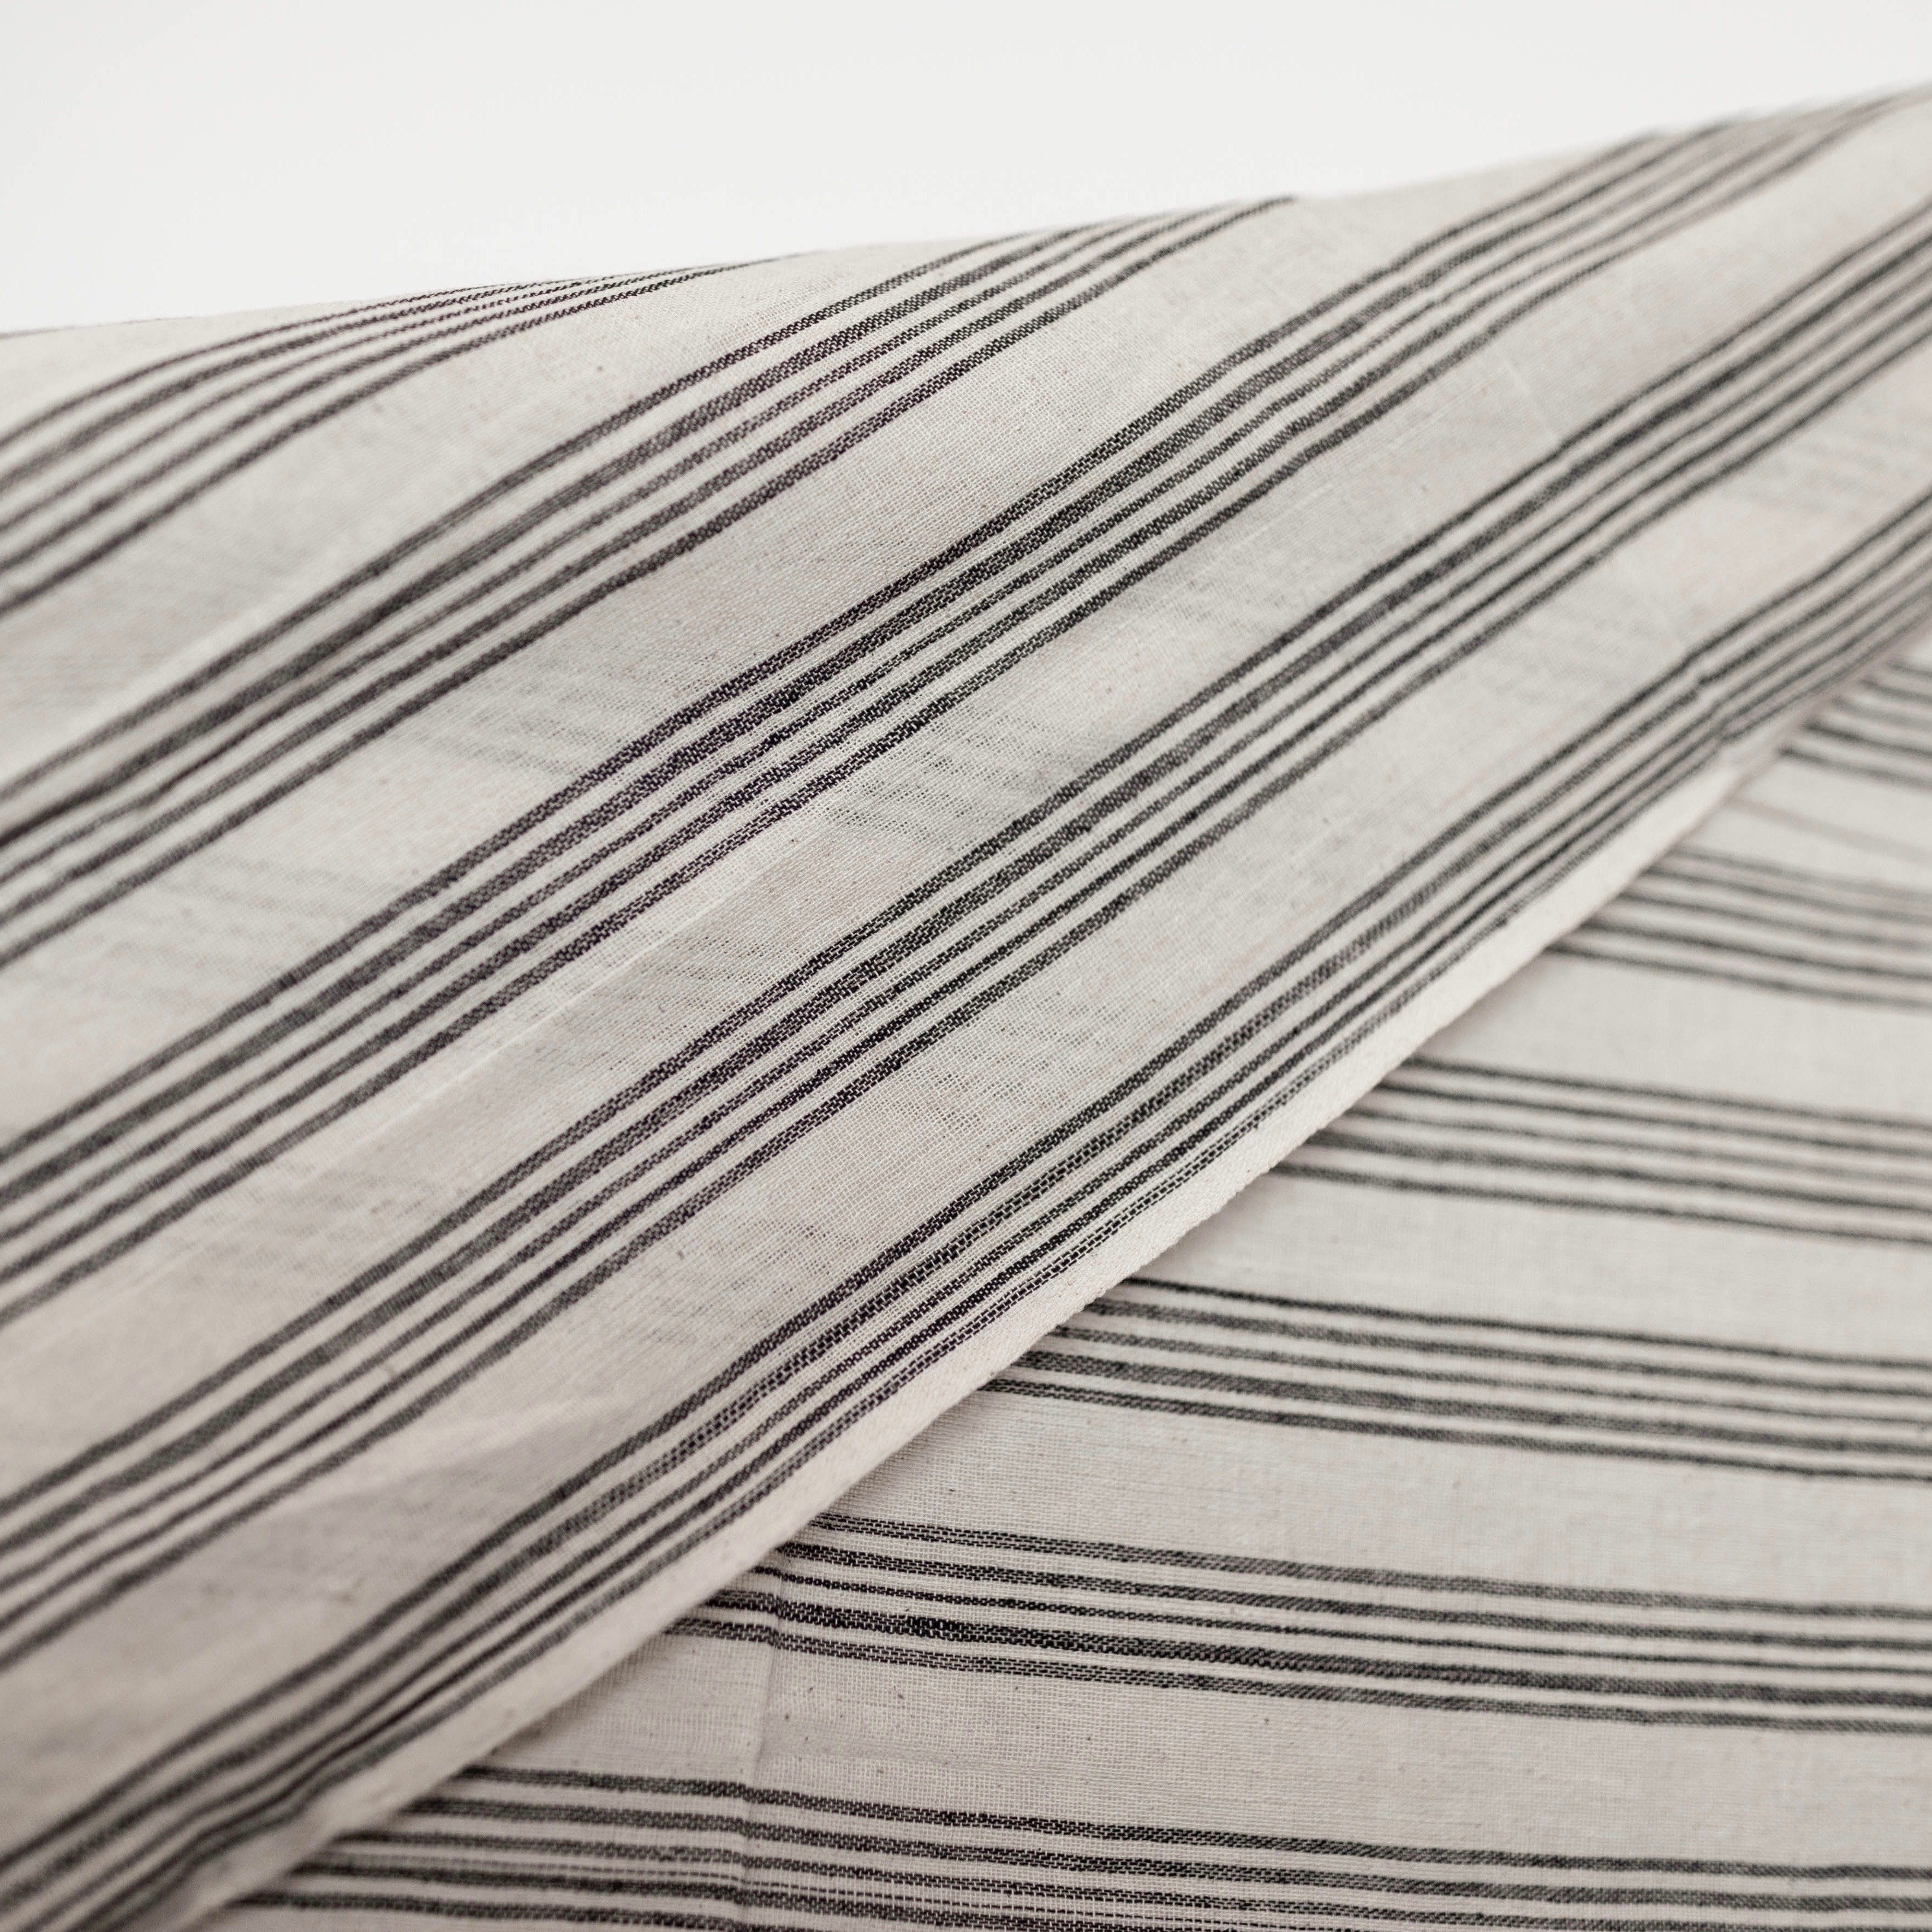 Black Striped Kotpad Cotton, Fair Trade Handwoven